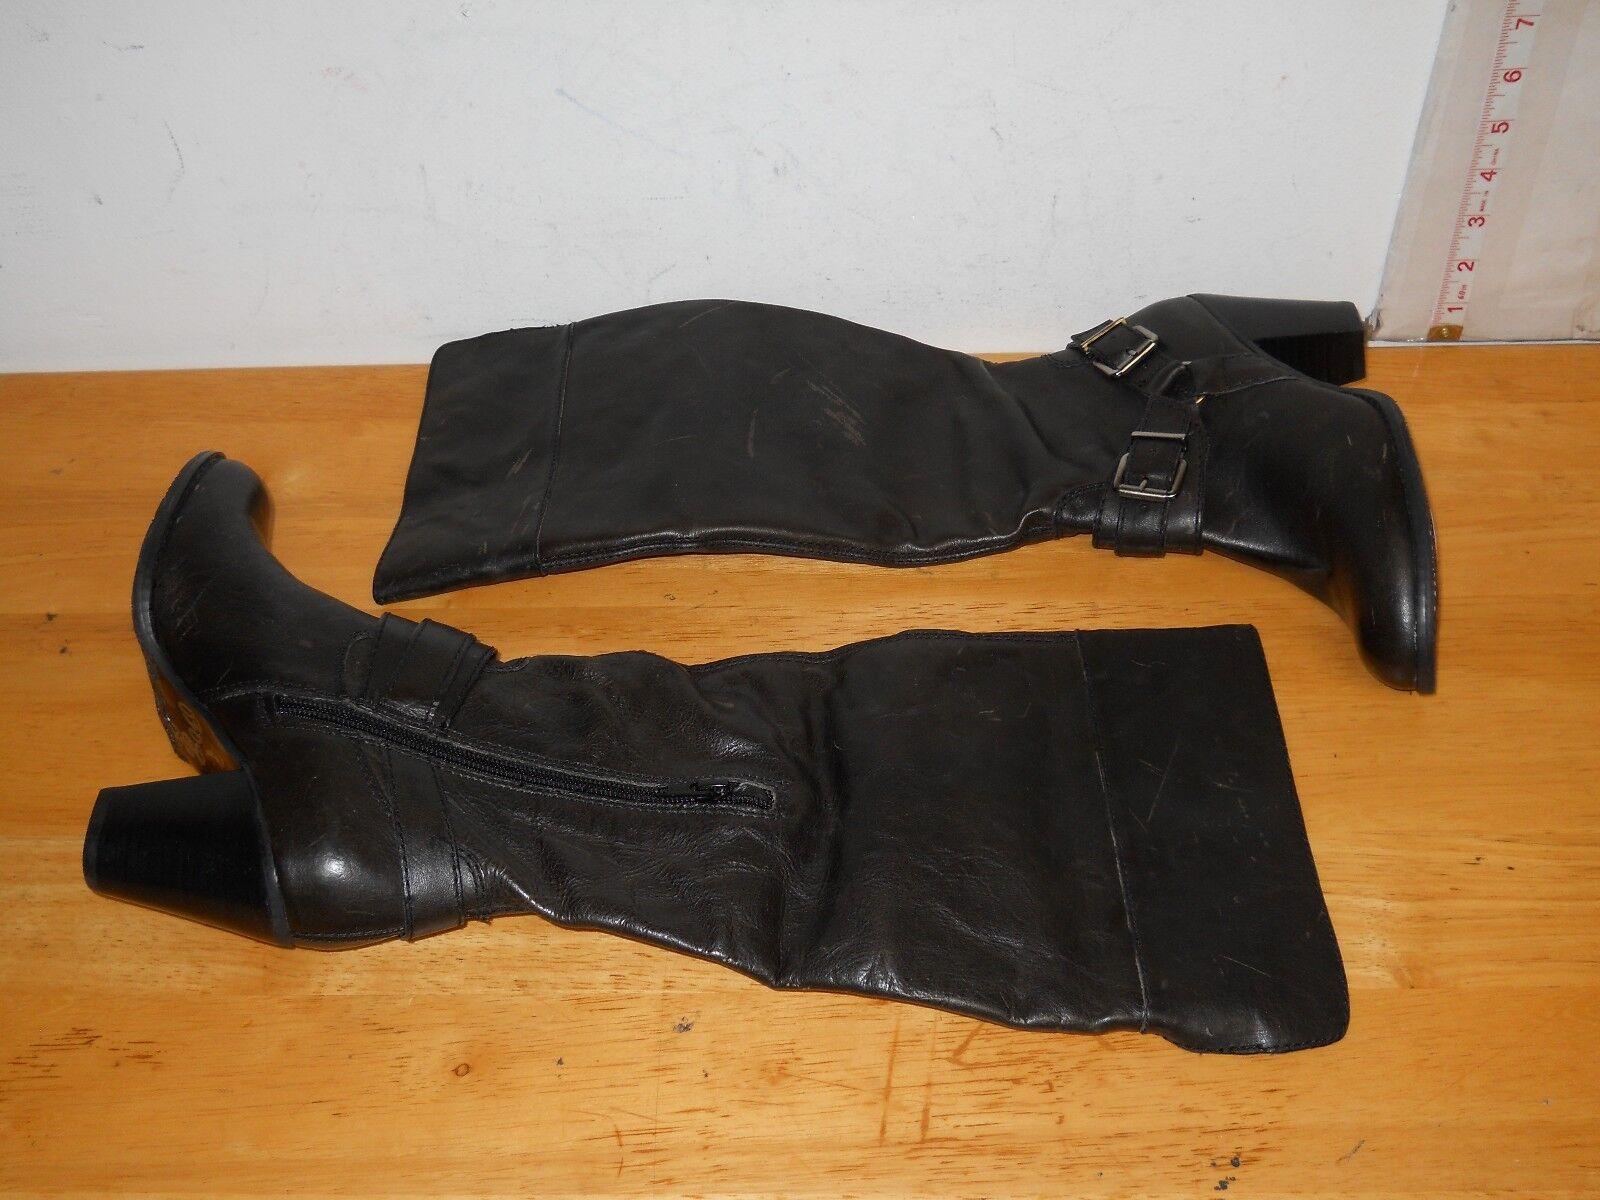 Arturo Chiang NEU Damenschuhe Vala Distressed Charcoal Stiefel 6.5 M Schuhes NWOB